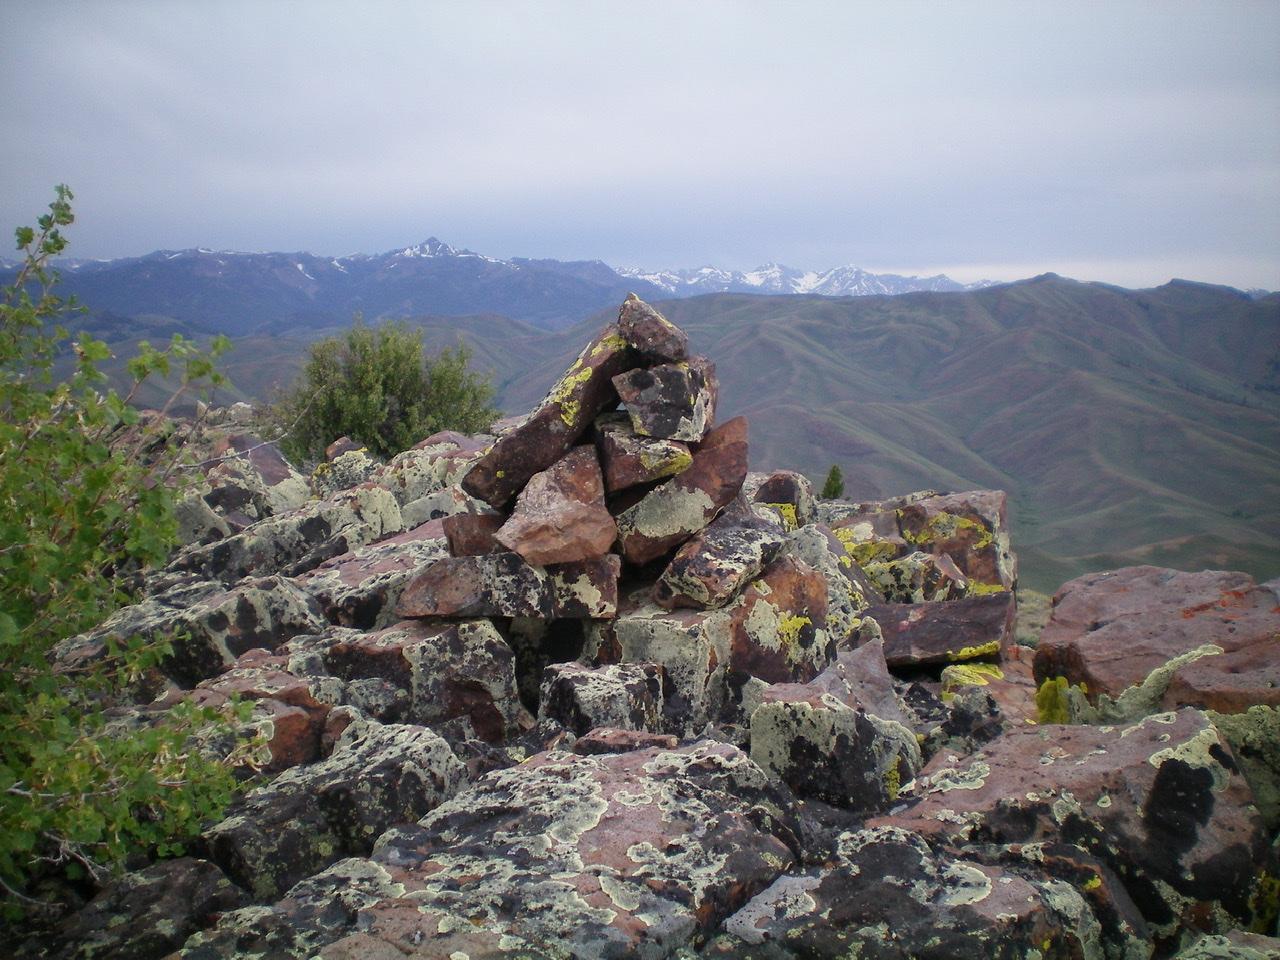 The summit cairn atop Peak 8700. Livingston Douglas Photo